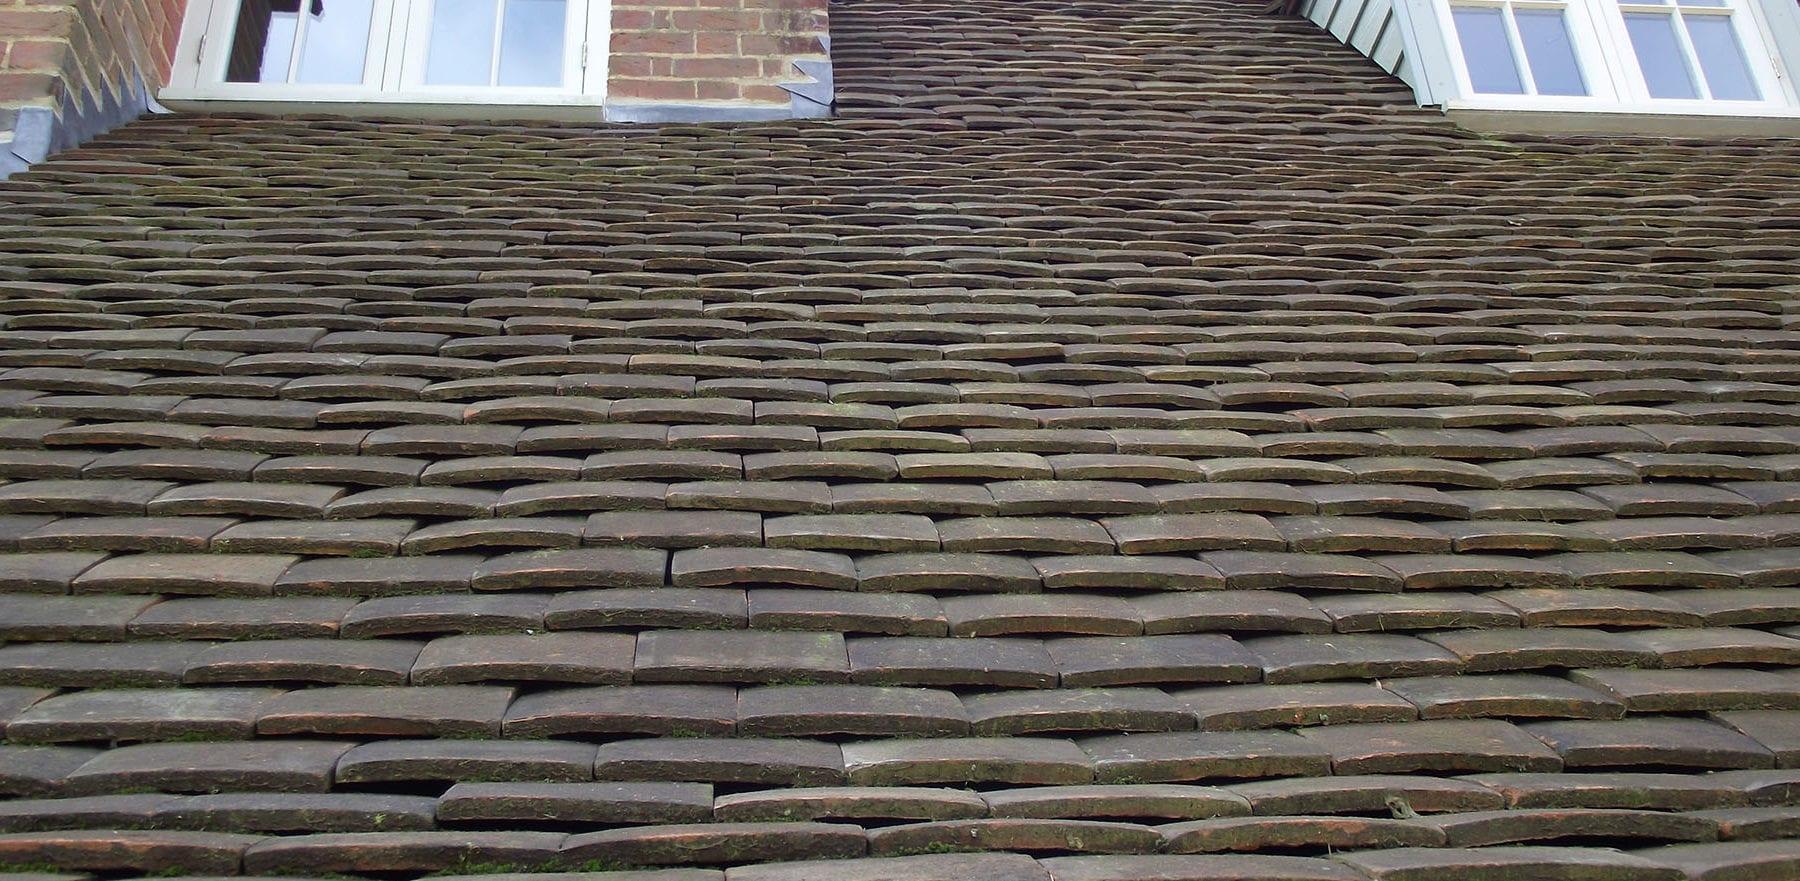 Lifestiles - Handmade Restoration Clay Roof Tiles - Liphook, England 6